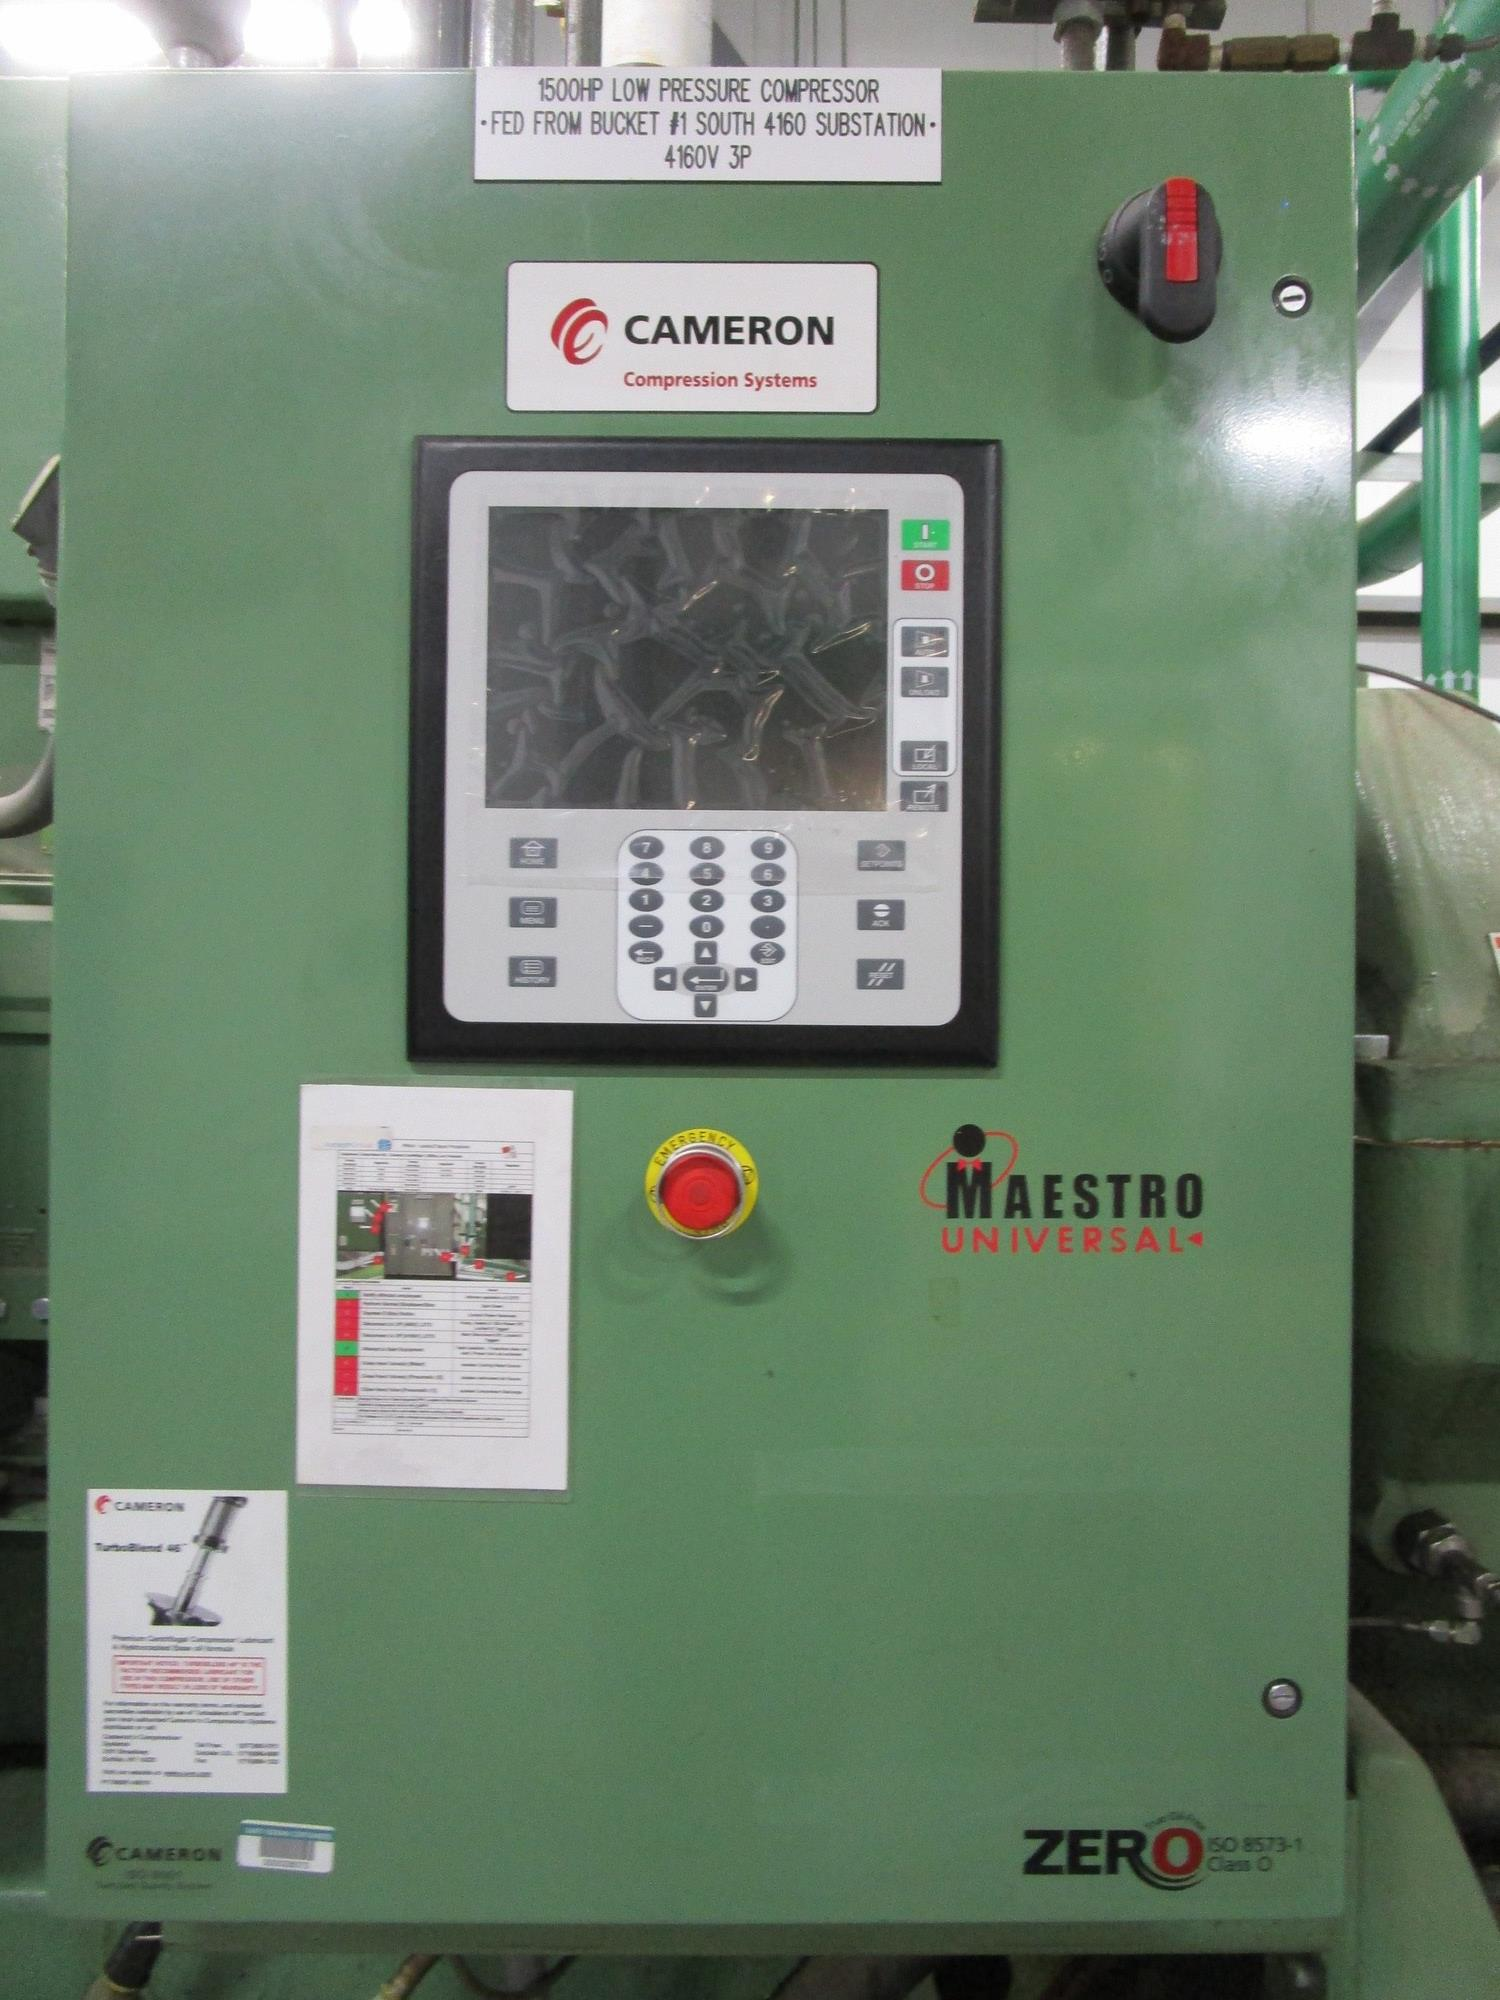 2010 Cameron 1,500 HP Low Pressure Compressor, Turbo-Air 9000 s/n 16900, True Oil F | Rig Fee: $4000 - Image 3 of 13